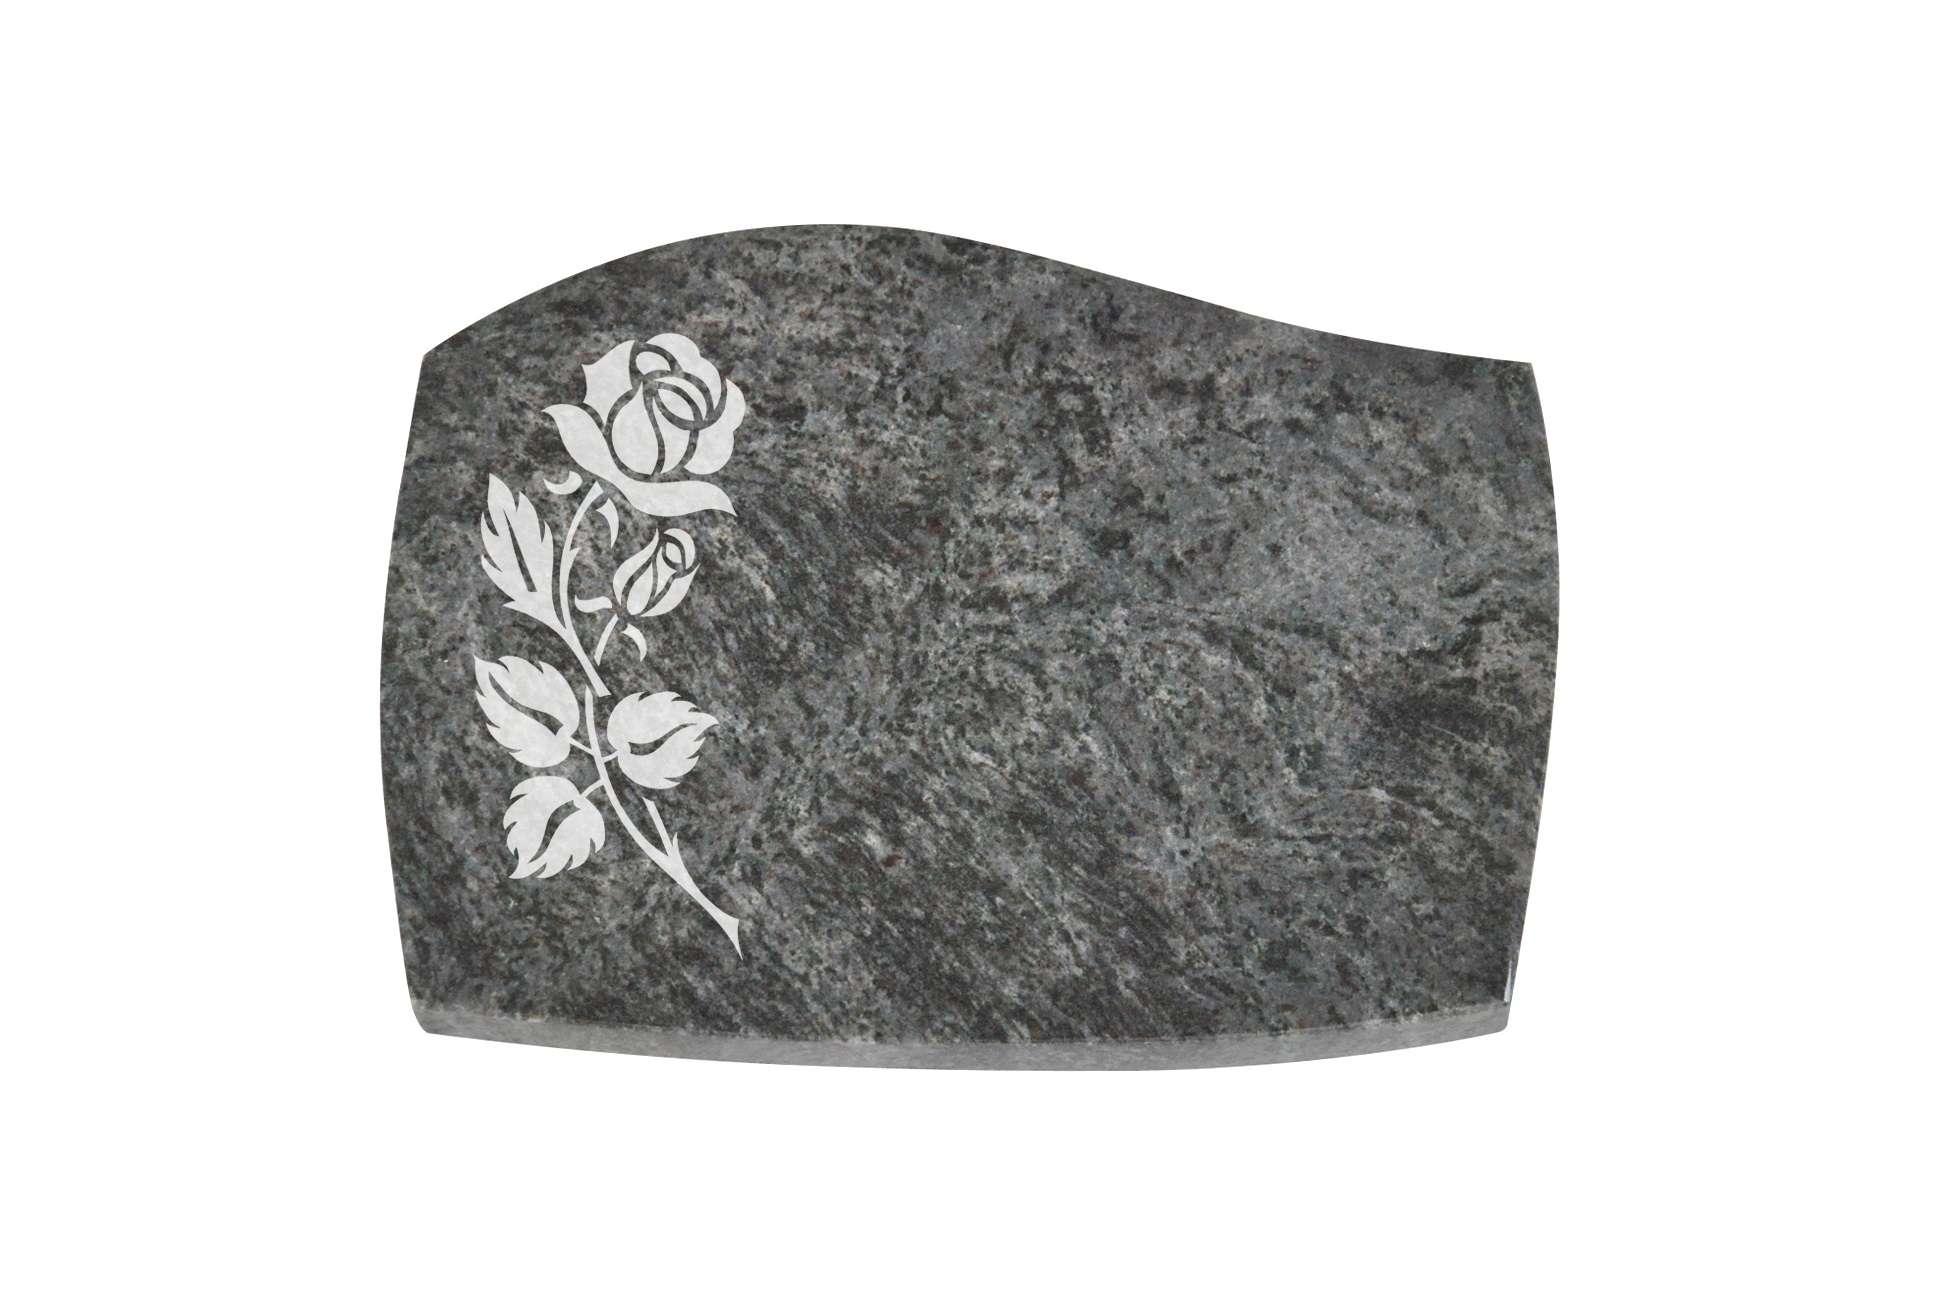 Liegestein Inschrift 40 x 30 x 3cm incl Grabstein